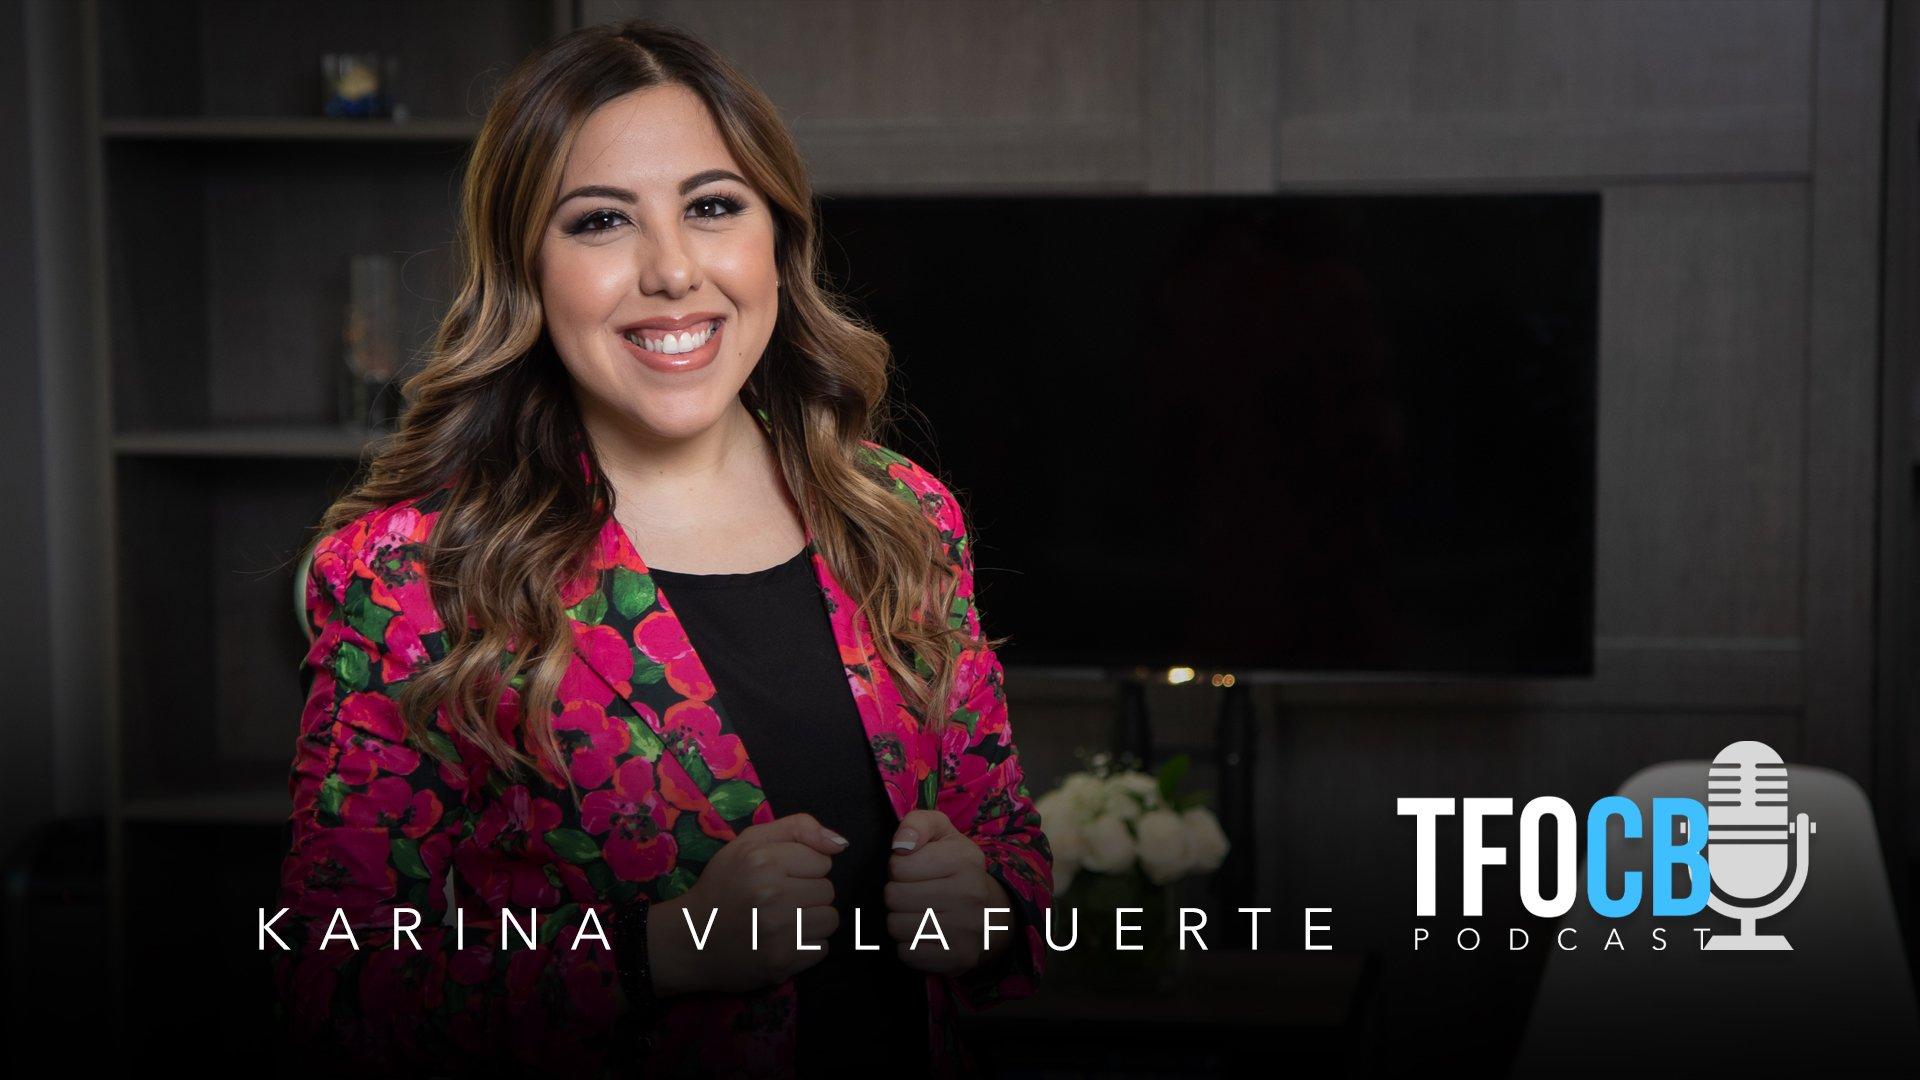 tfocb podcast cover karina villafuerte